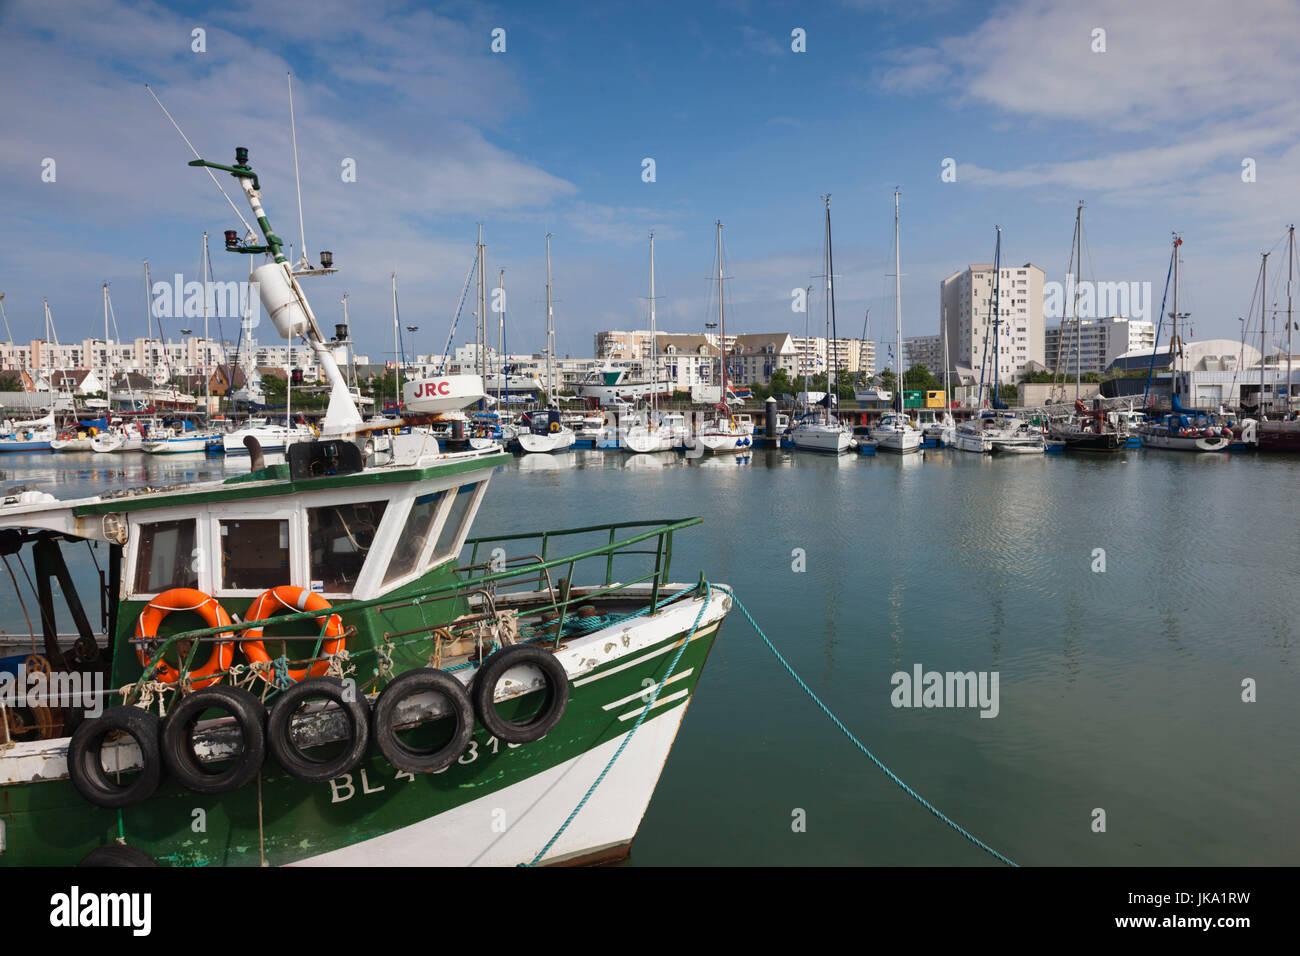 France, Nord-Pas de Calais Region, Pas de Calais Department, Calais, port view - Stock Image